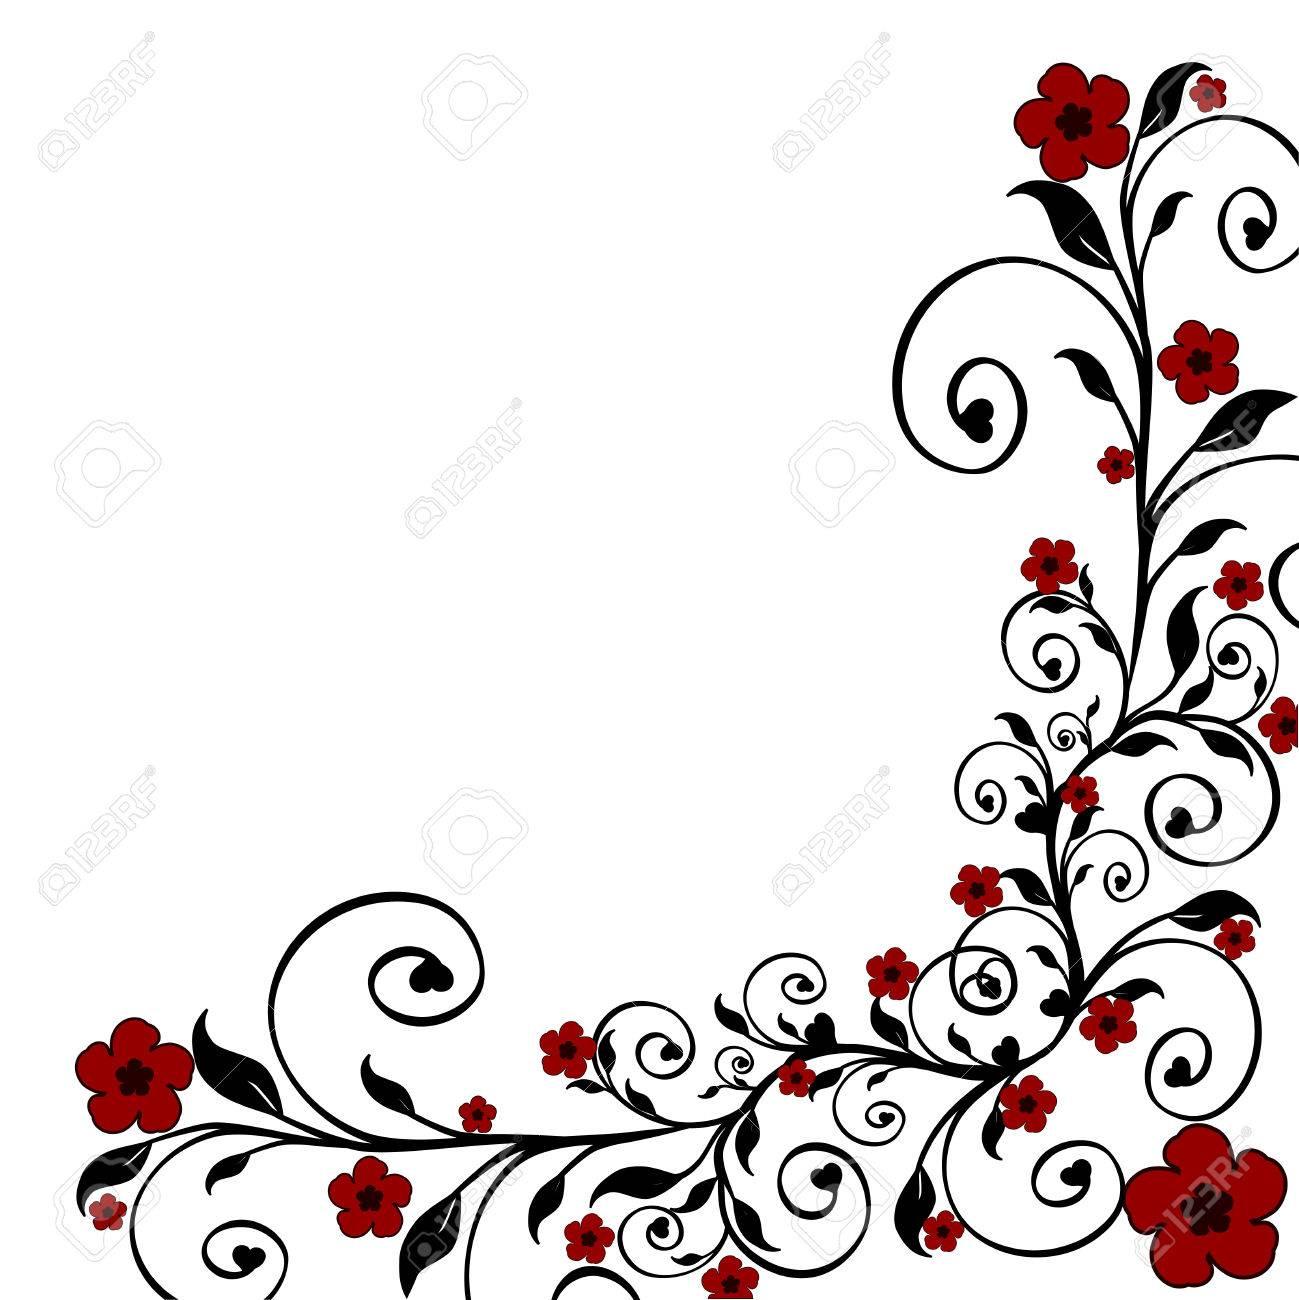 illustration of a floral ornament - 6672590